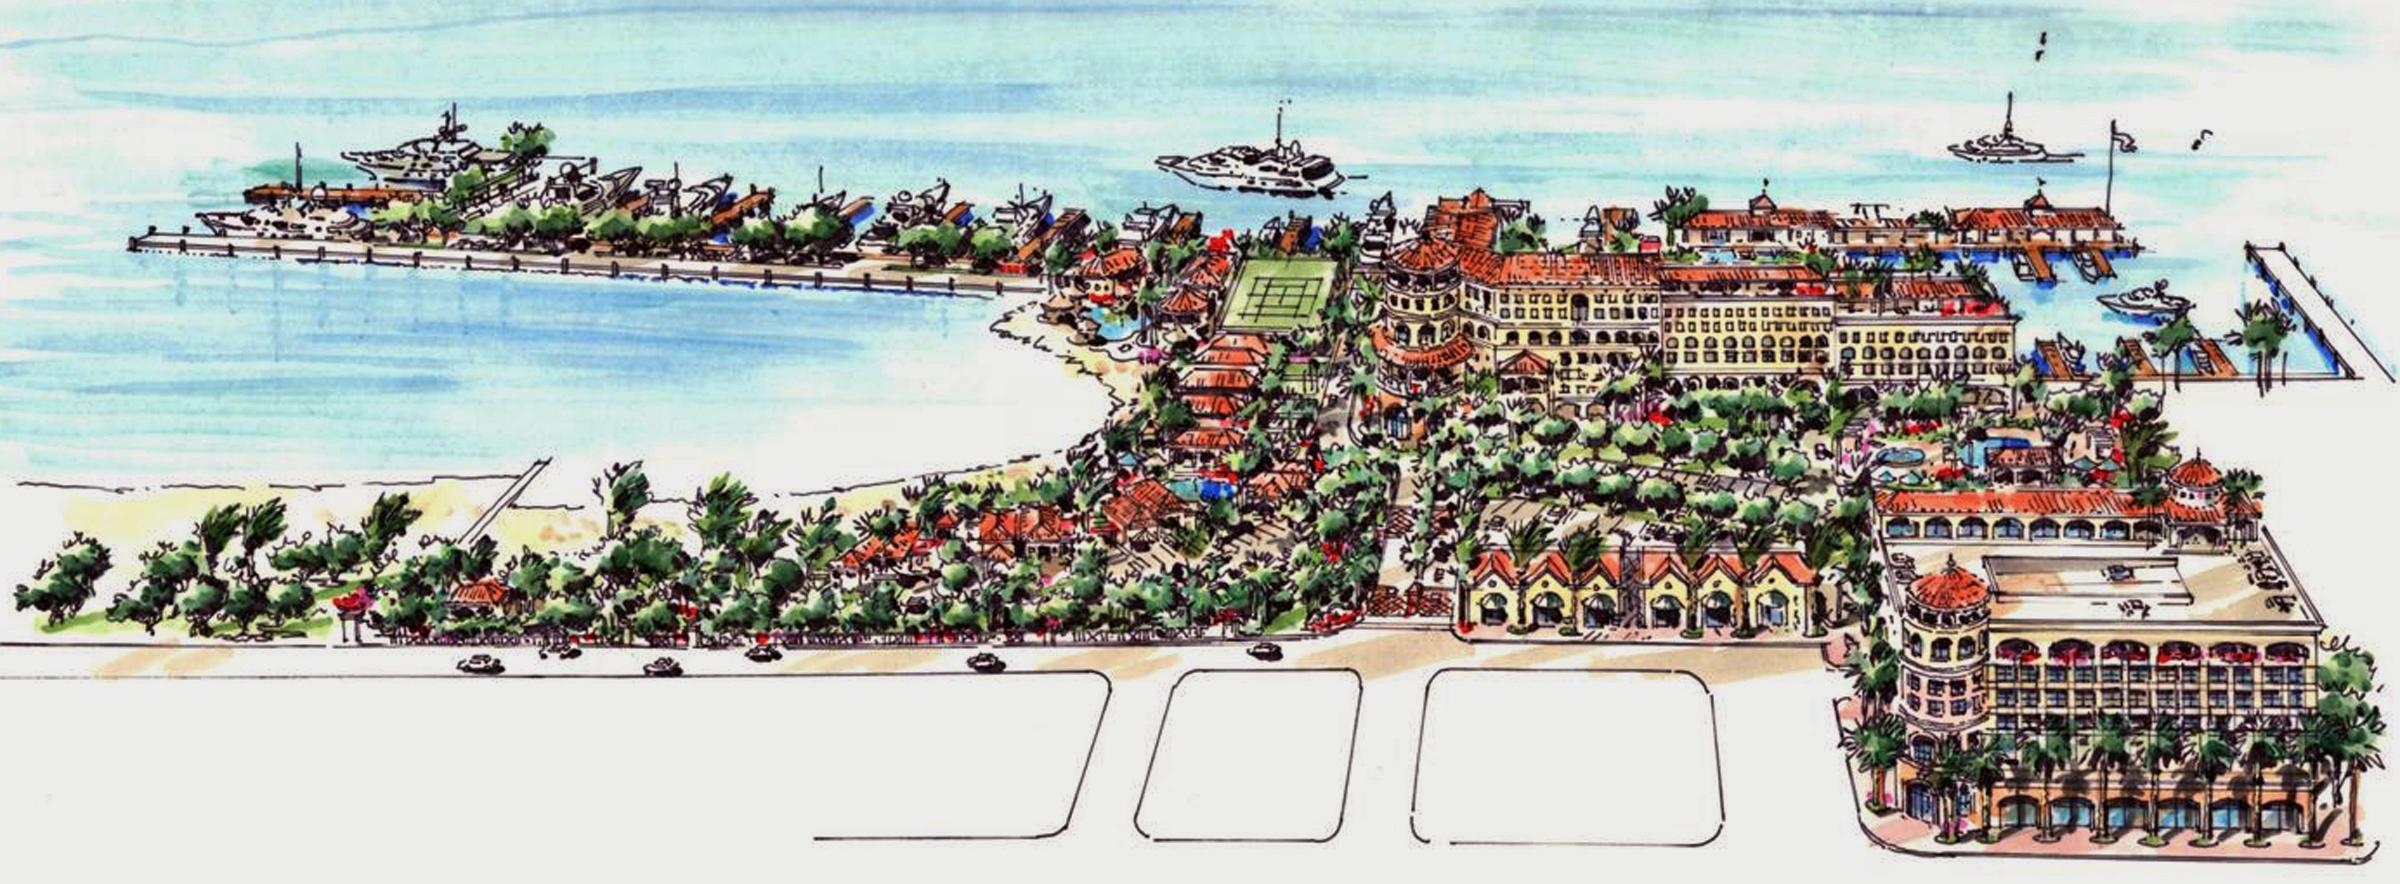 British Colonial Hilton Master Concept - Interior Island View